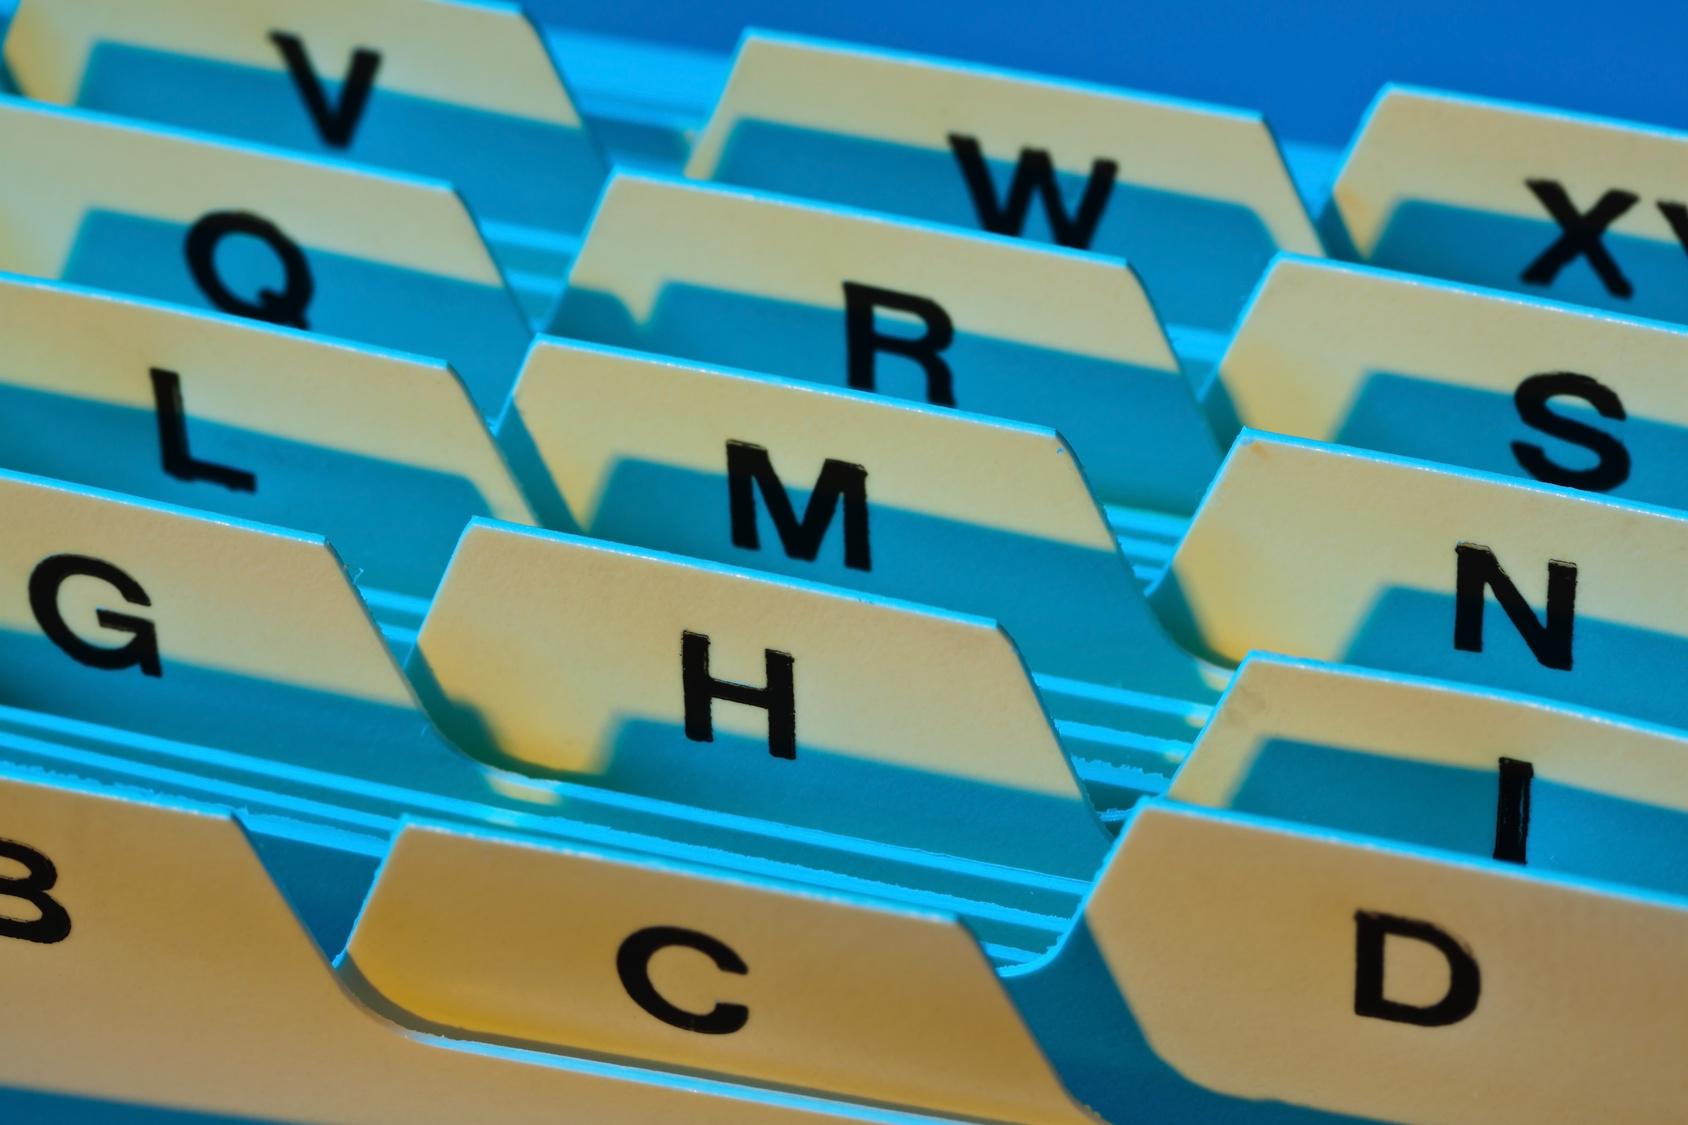 Jigsaw company lookup - Jigsaw Company Lookup 17